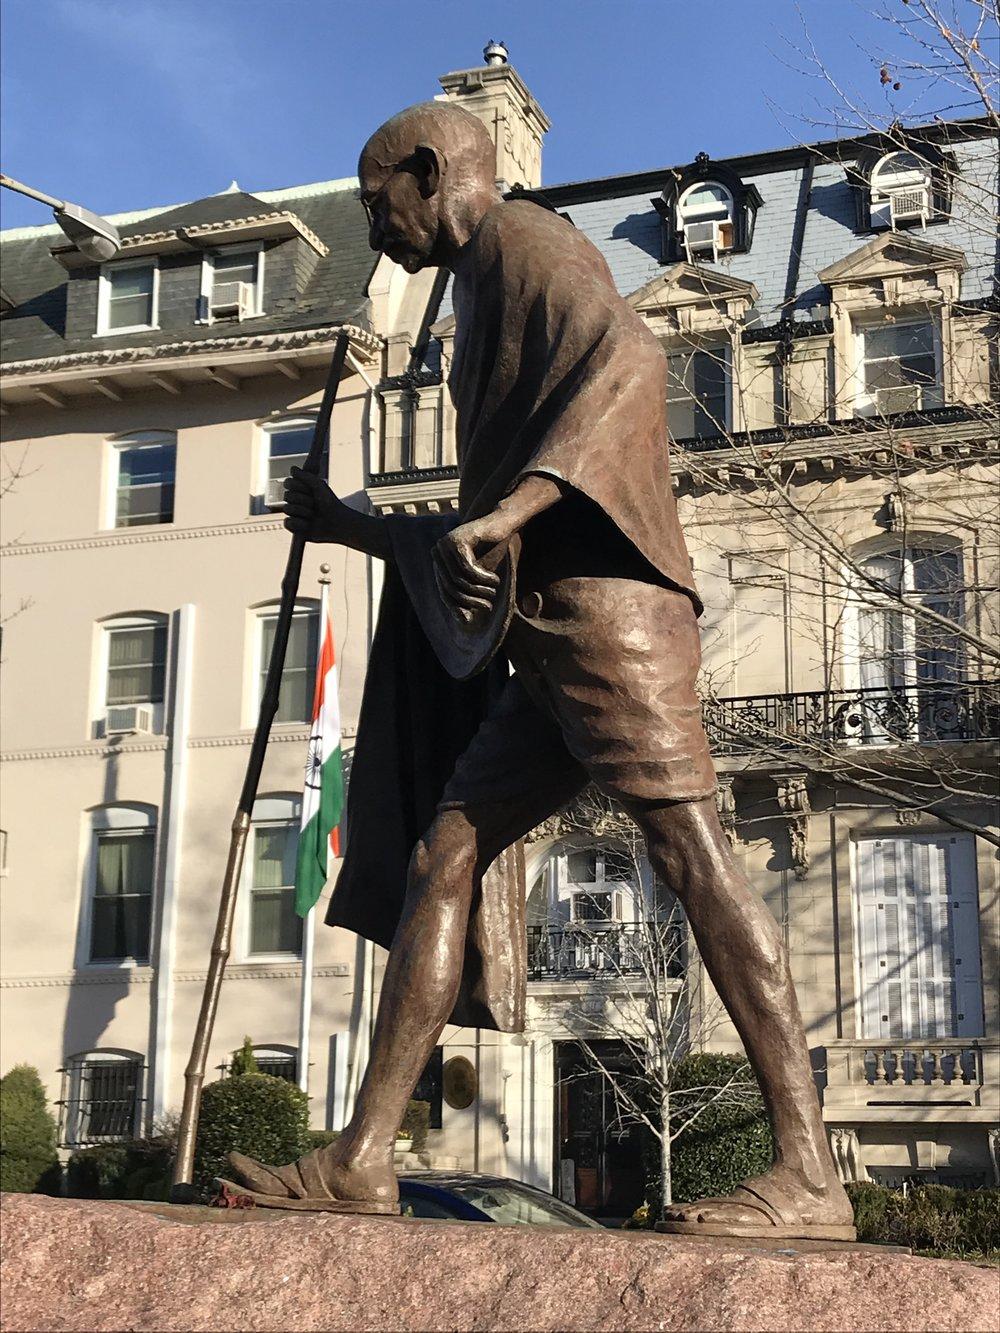 Mohandas K. Gandhi statue outside the Embassy of India.